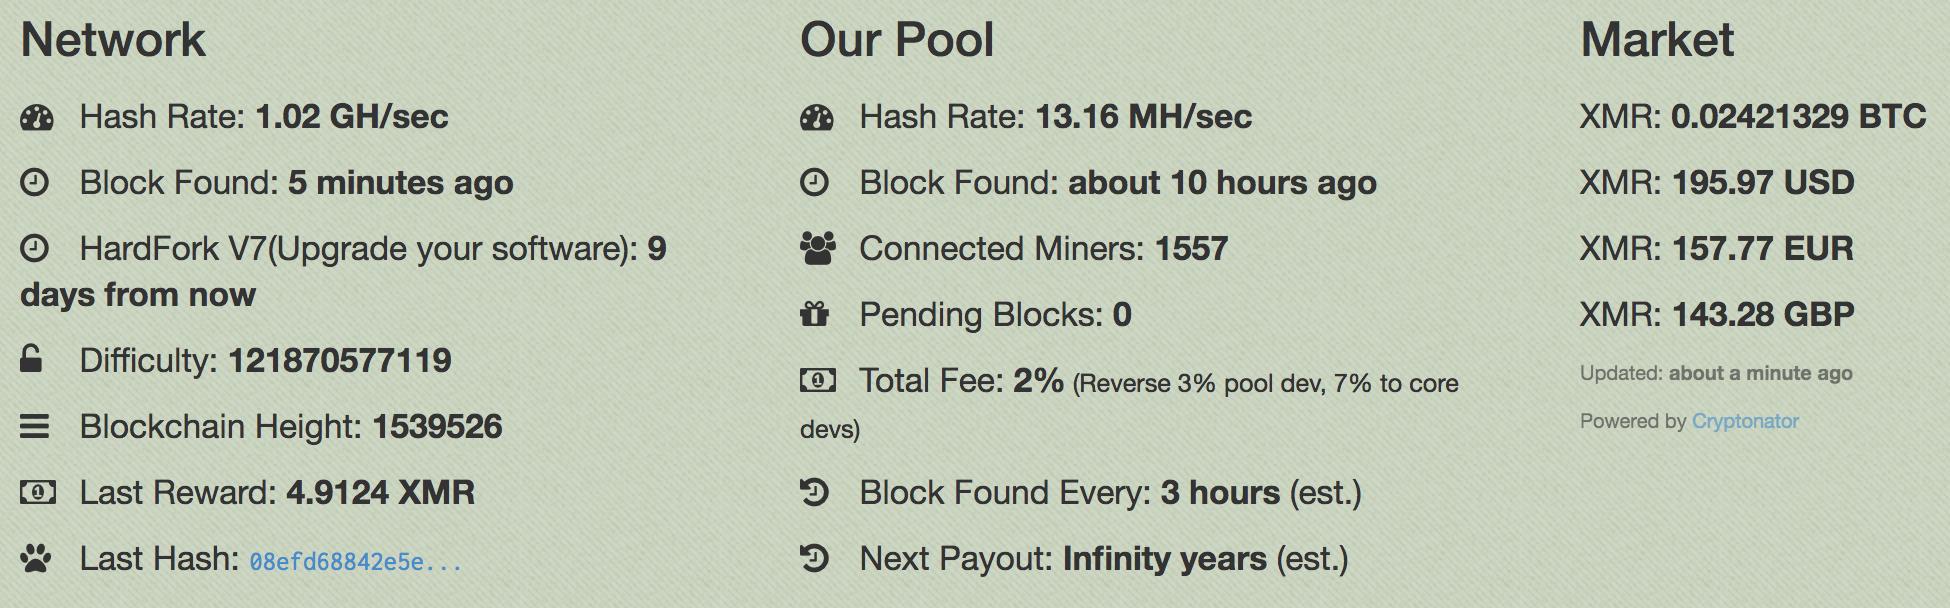 monero.crypto-pool.fr mining pool